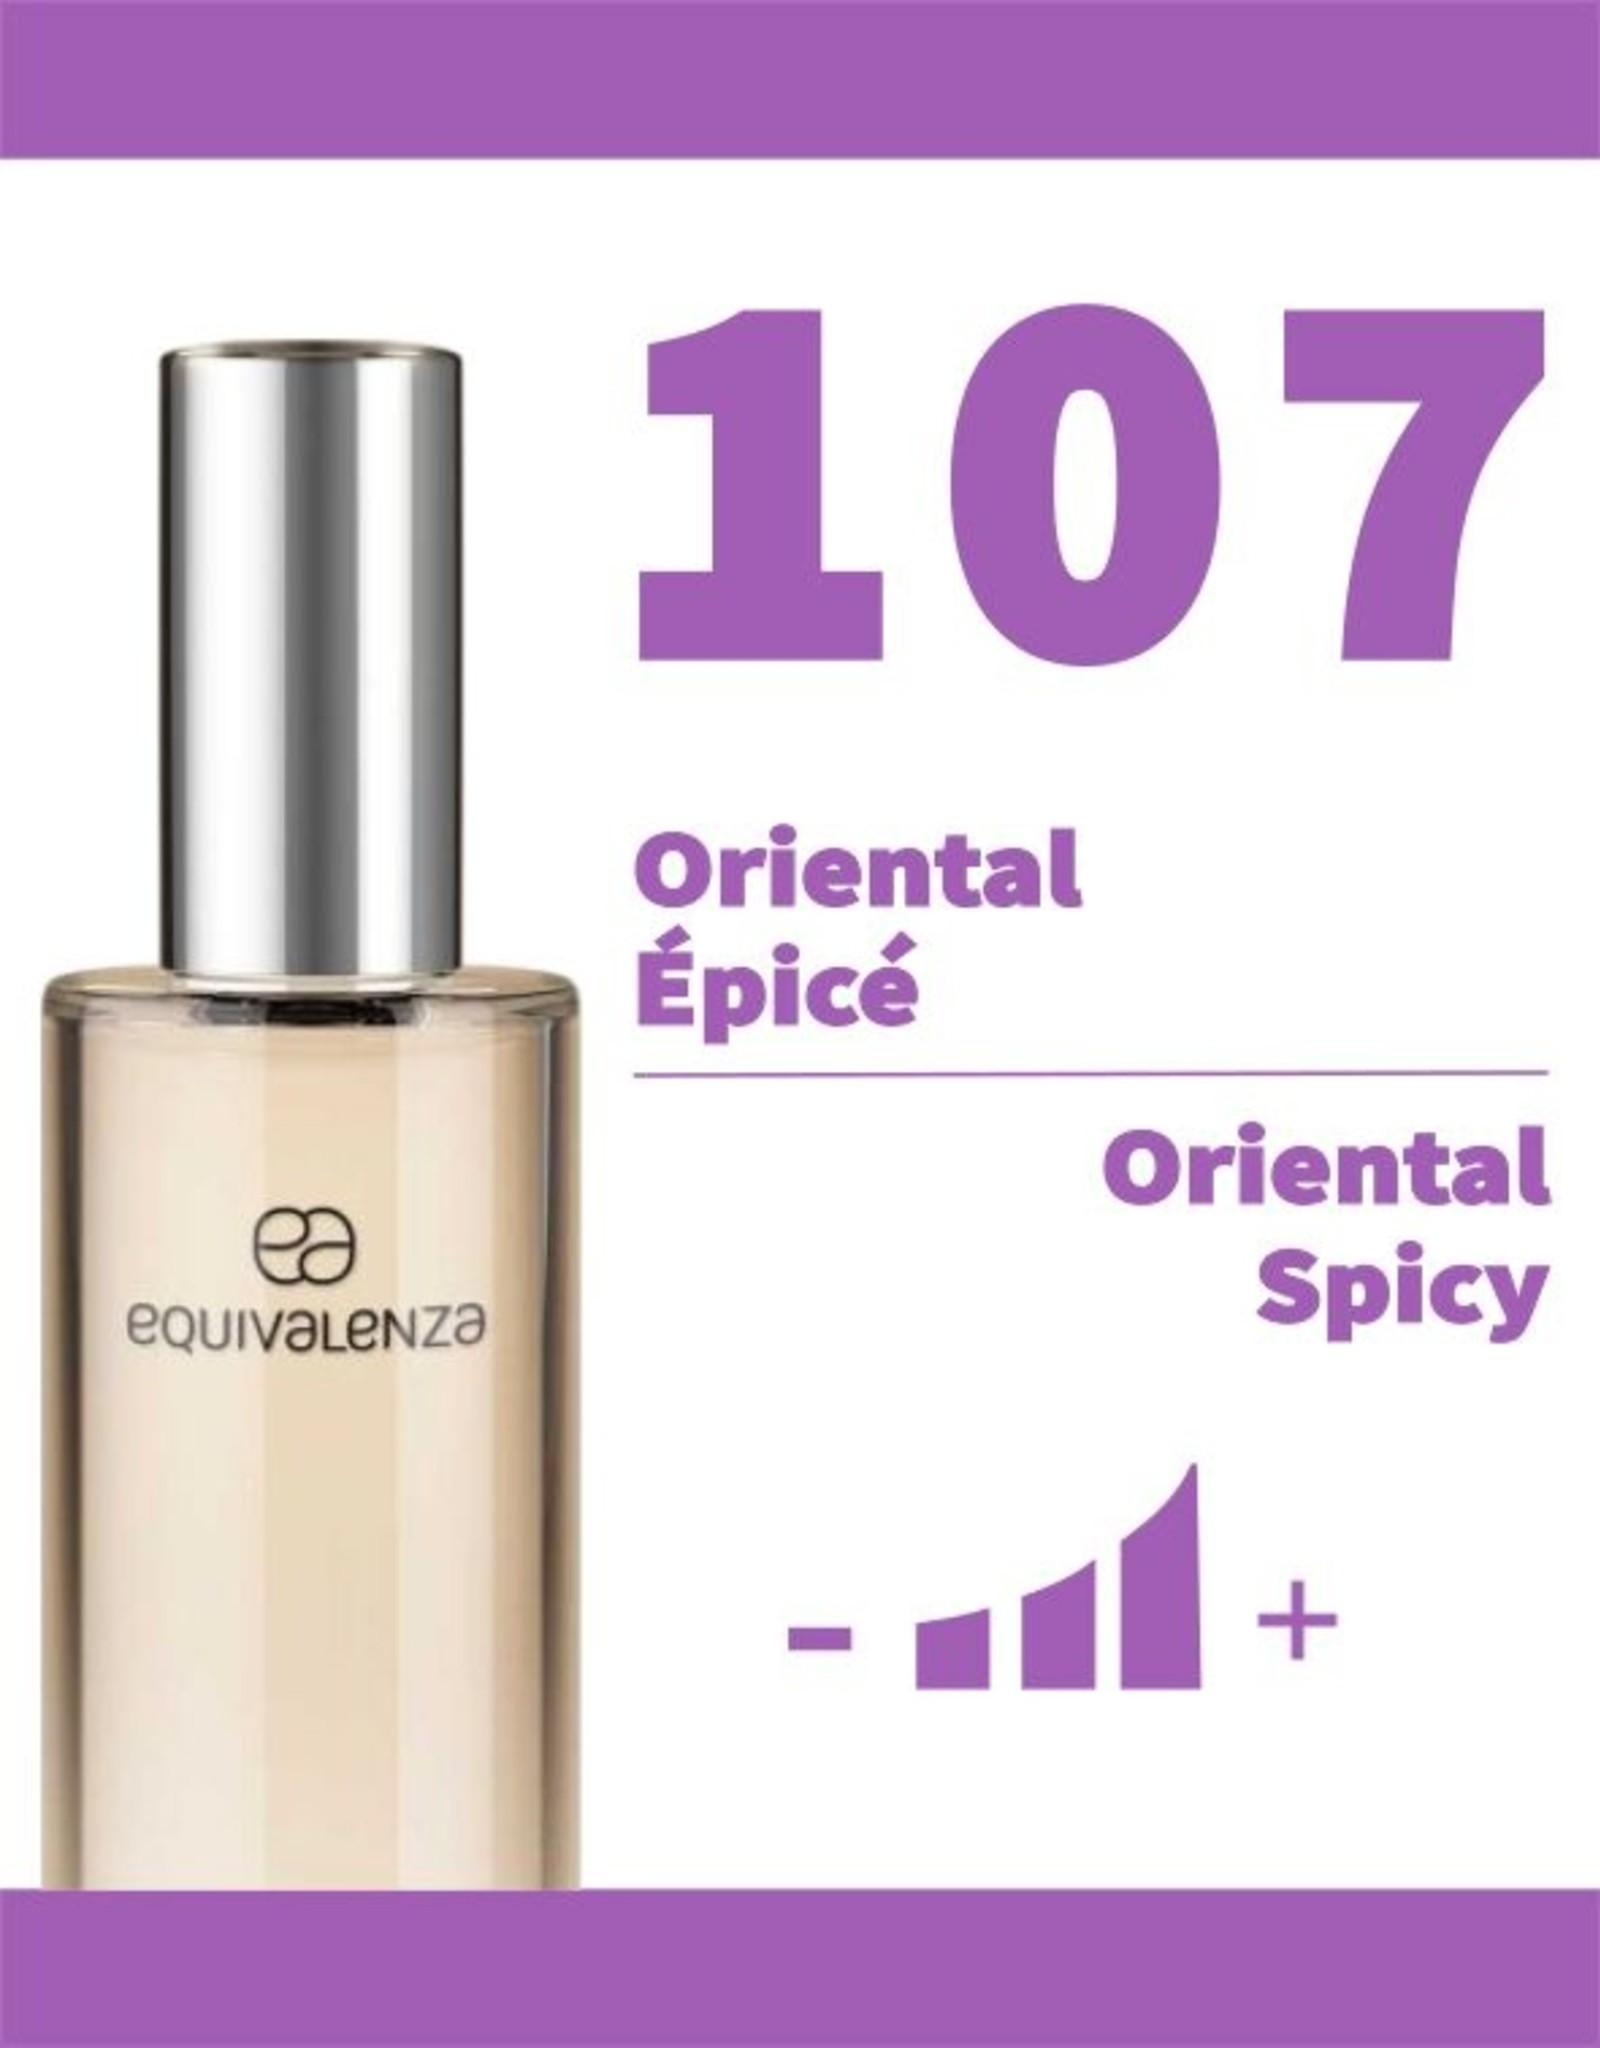 Equivalenza Eau de Toilette Oriental Spicy107